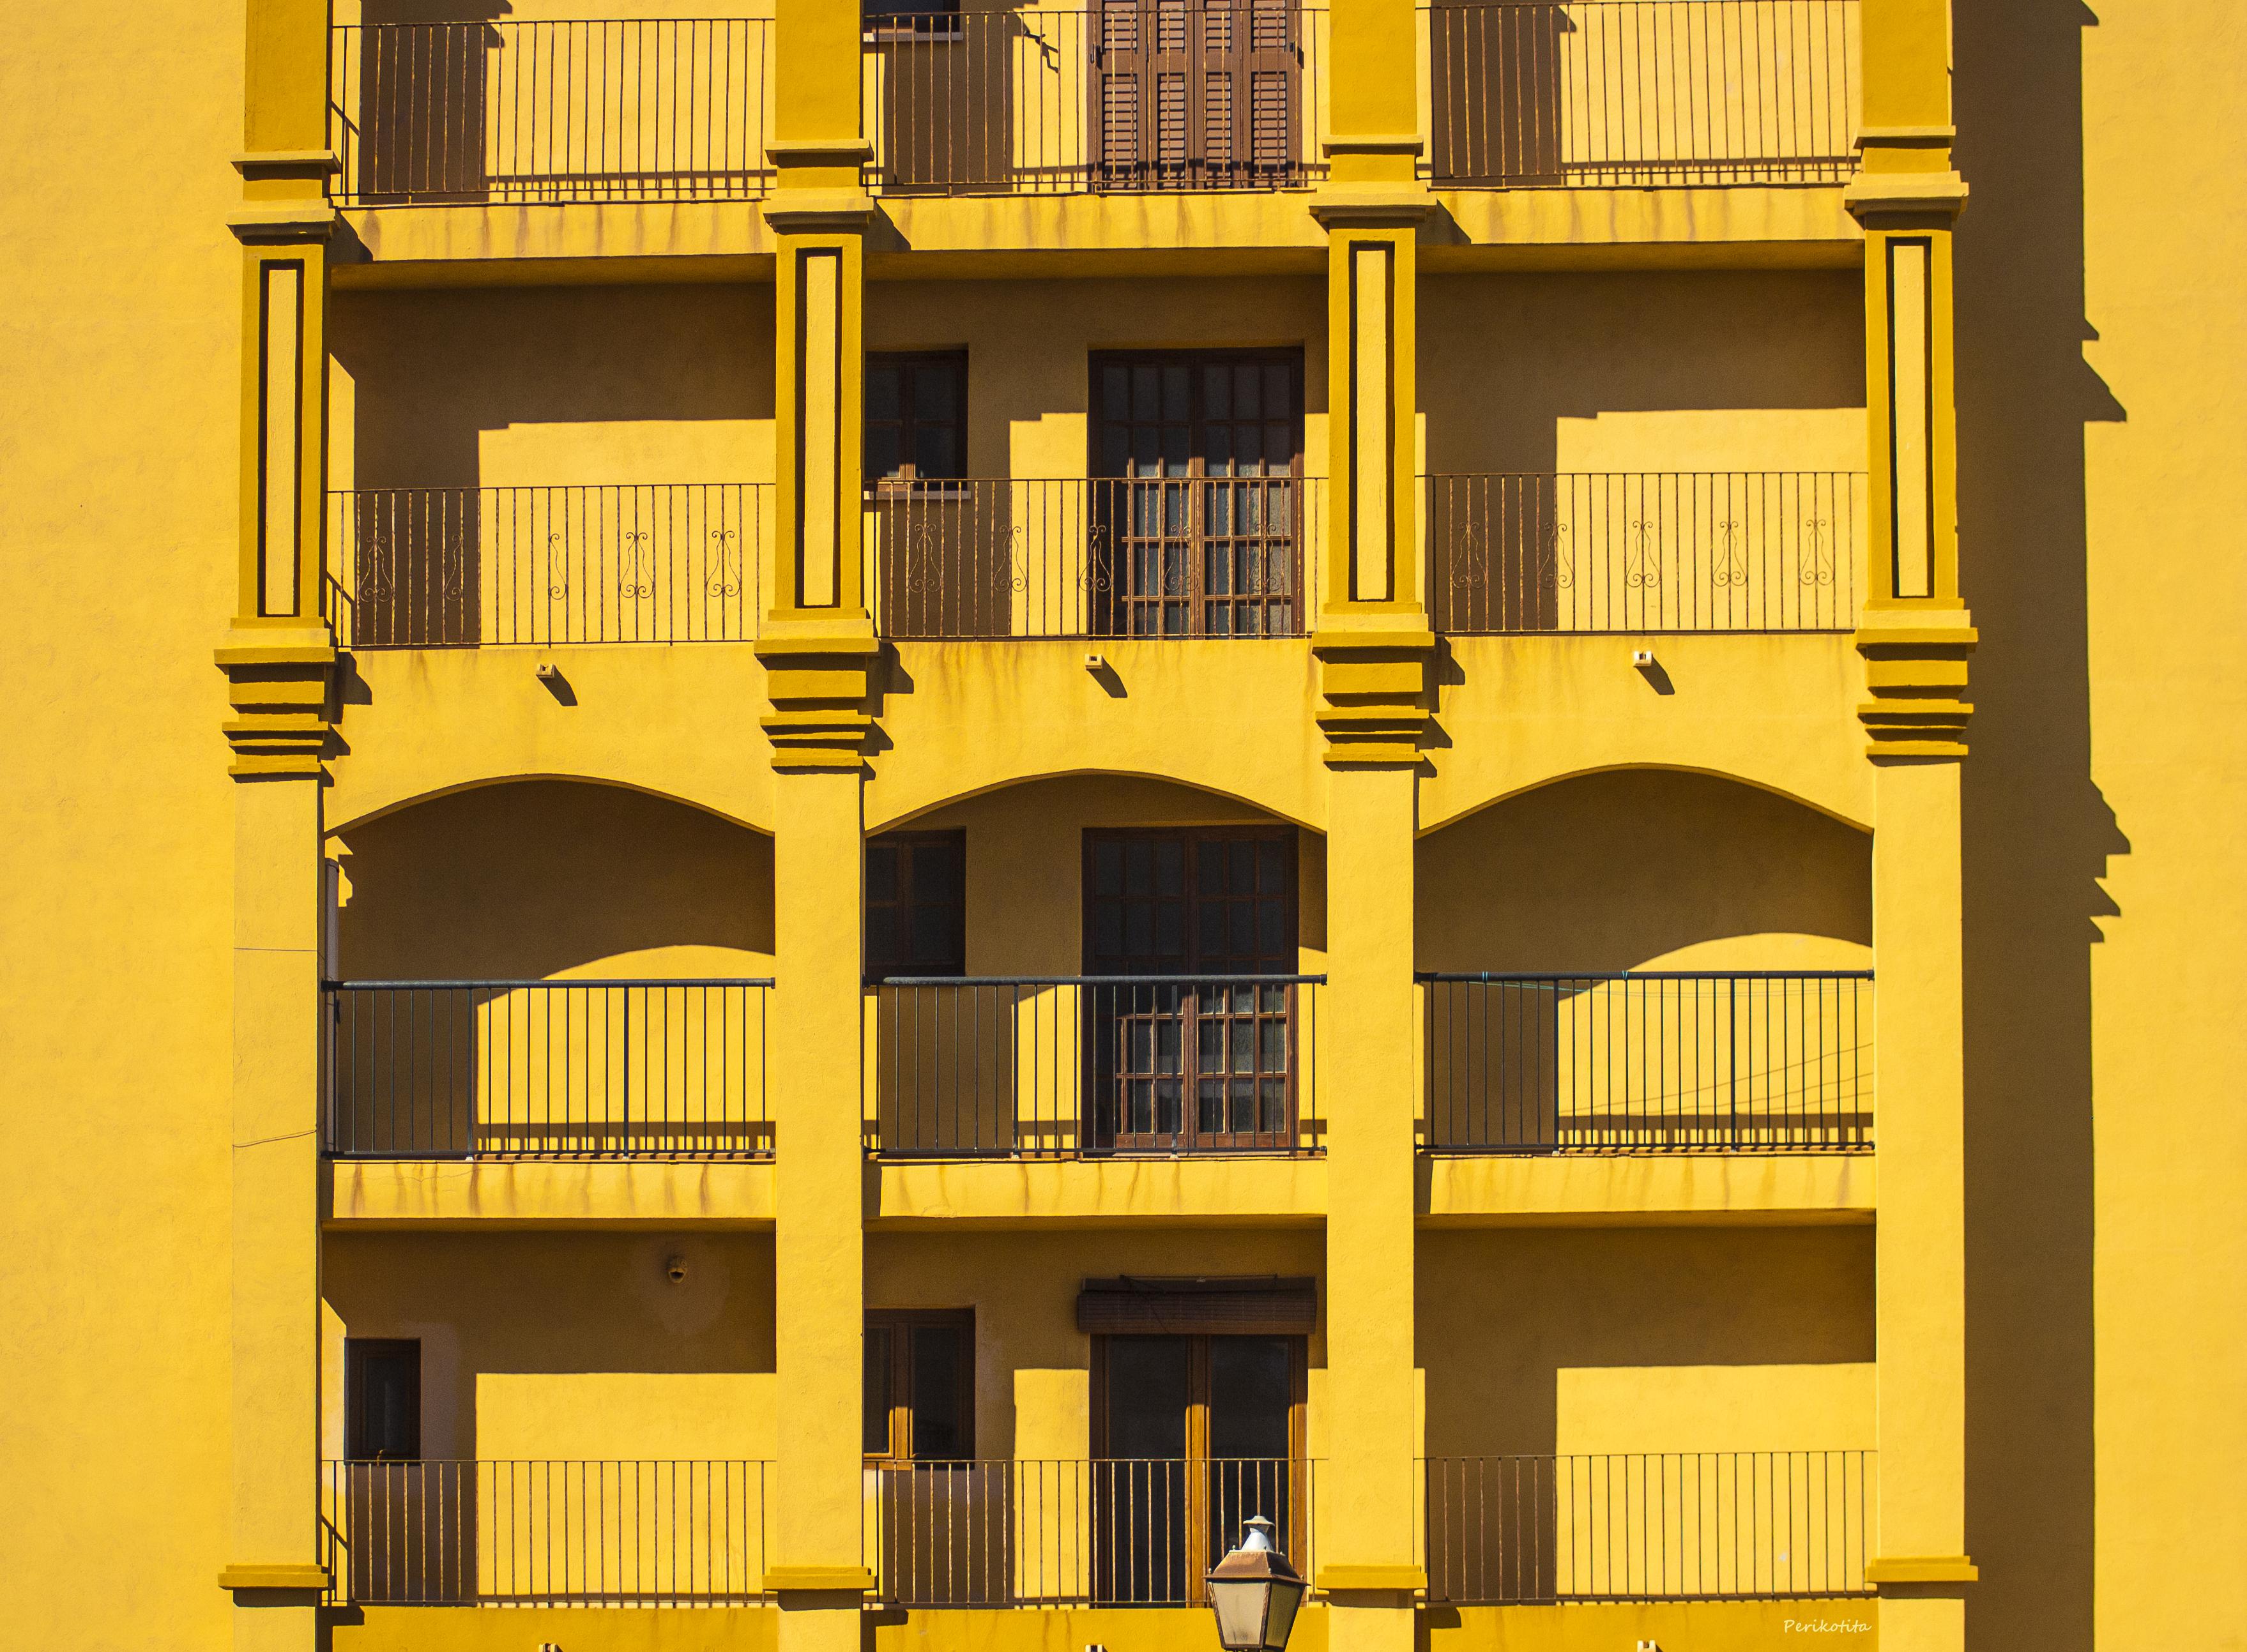 Panal amarillo arco